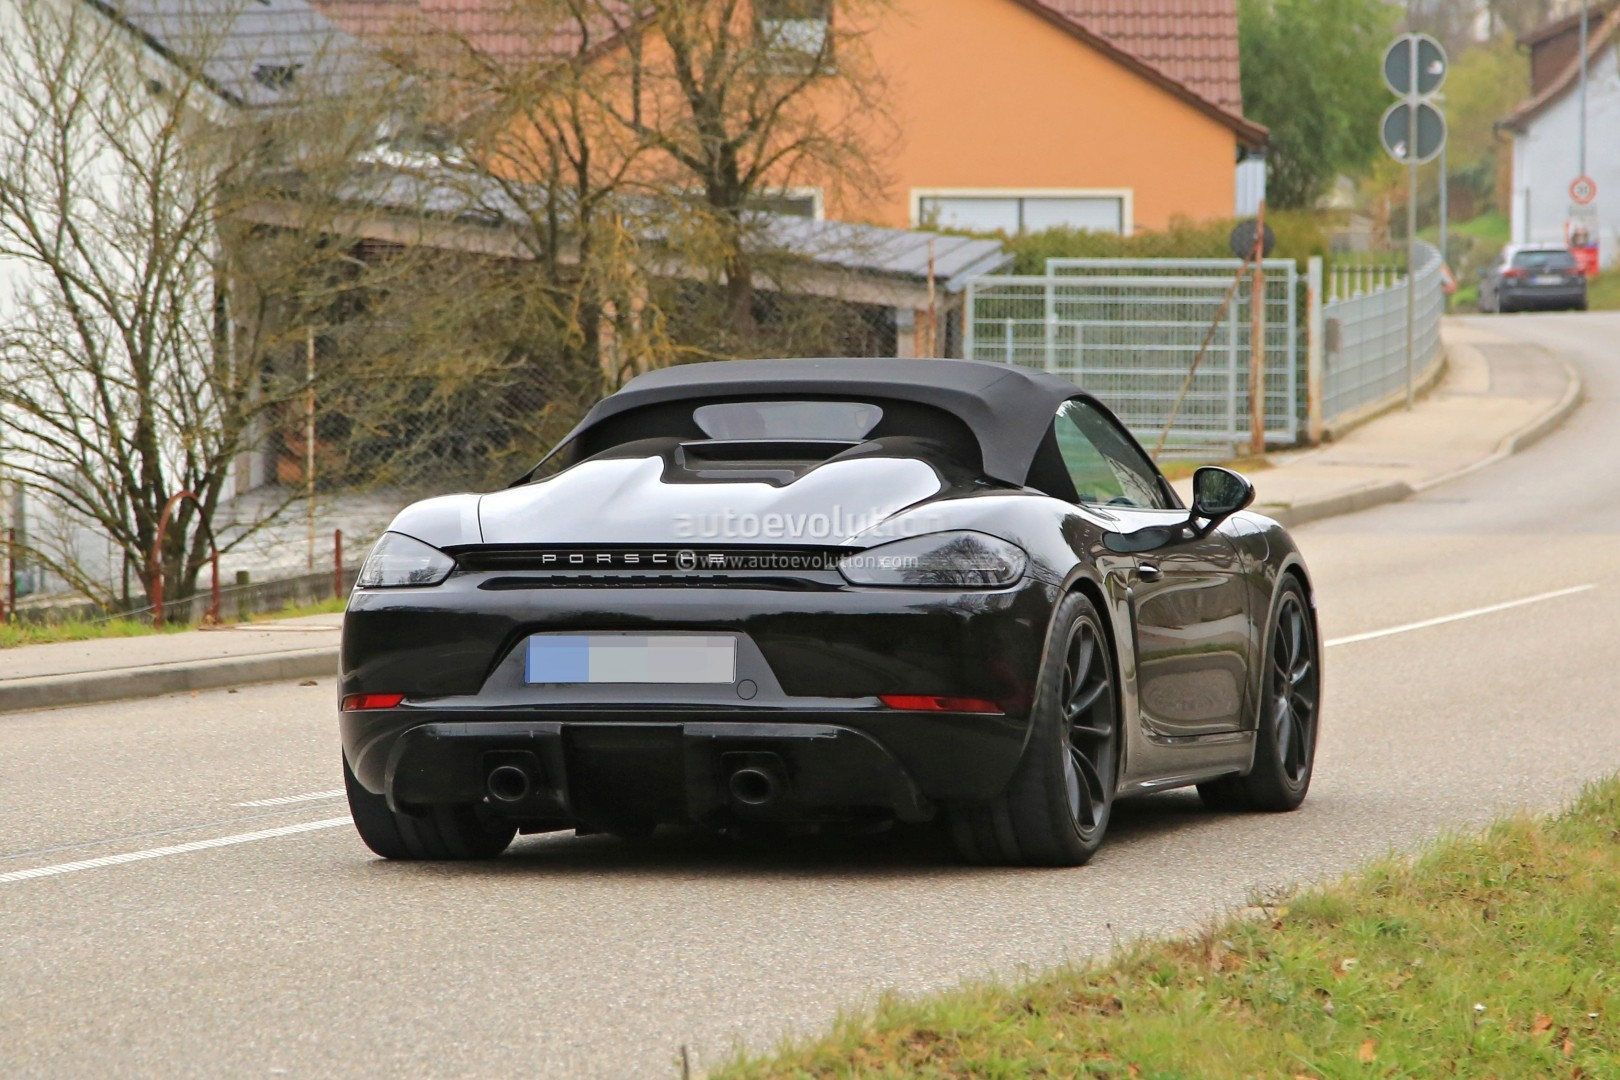 2019 Porsche 718 Boxster Spyder Makes Spyshot Debut with ...